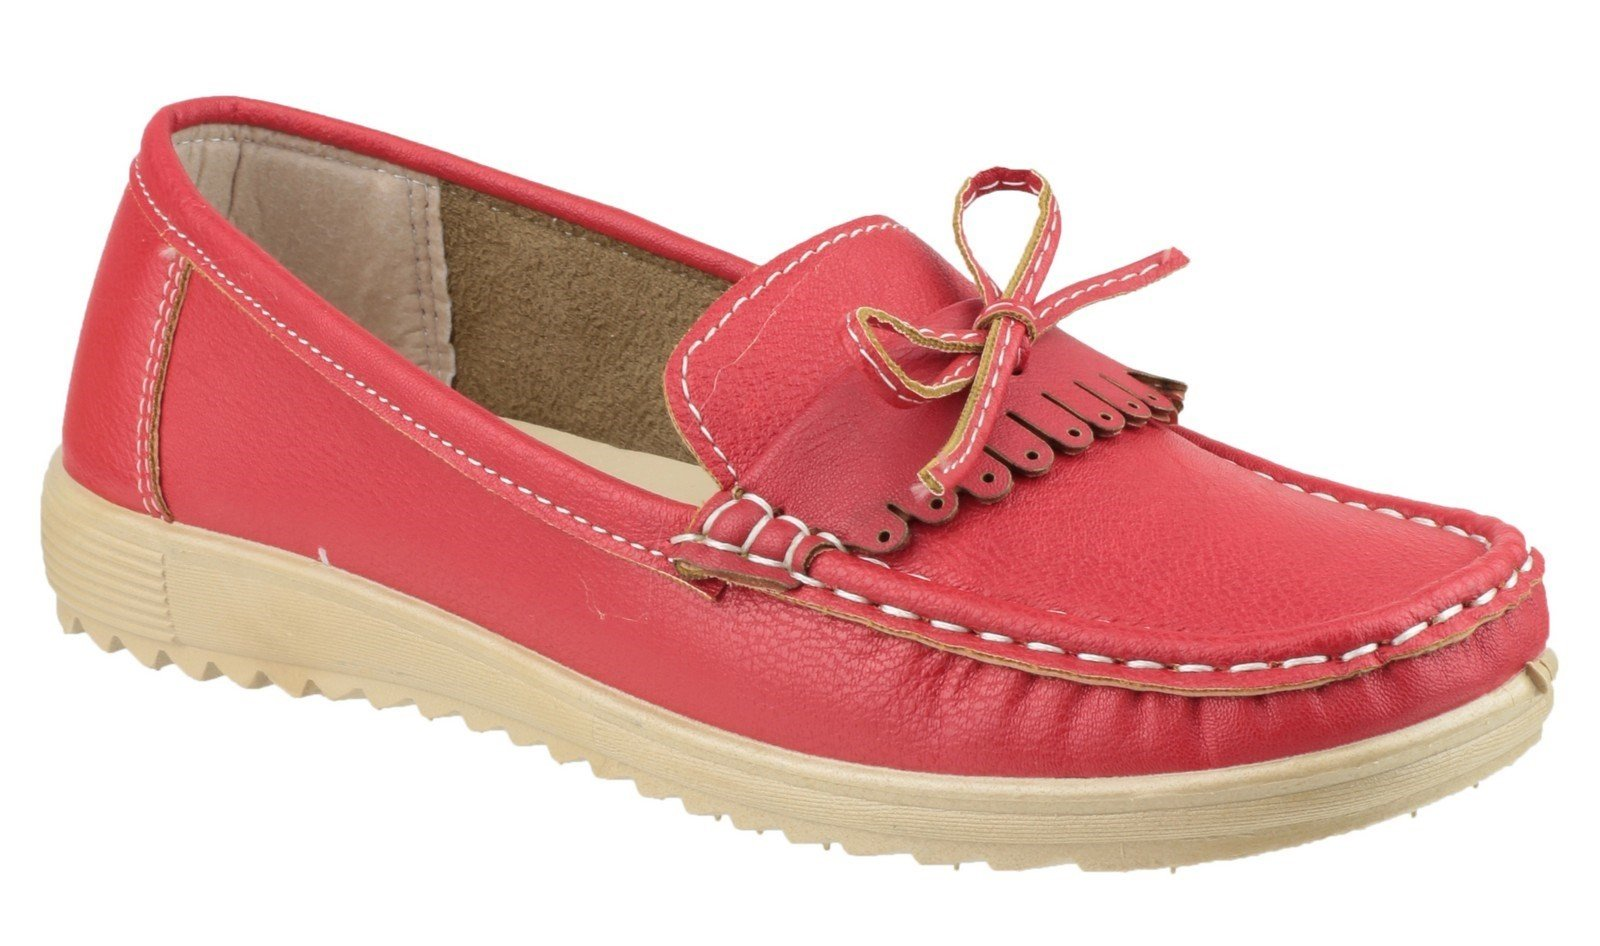 Fleet & Foster Women's Elba Loafer Various Colours 20939-33260 - Red 3